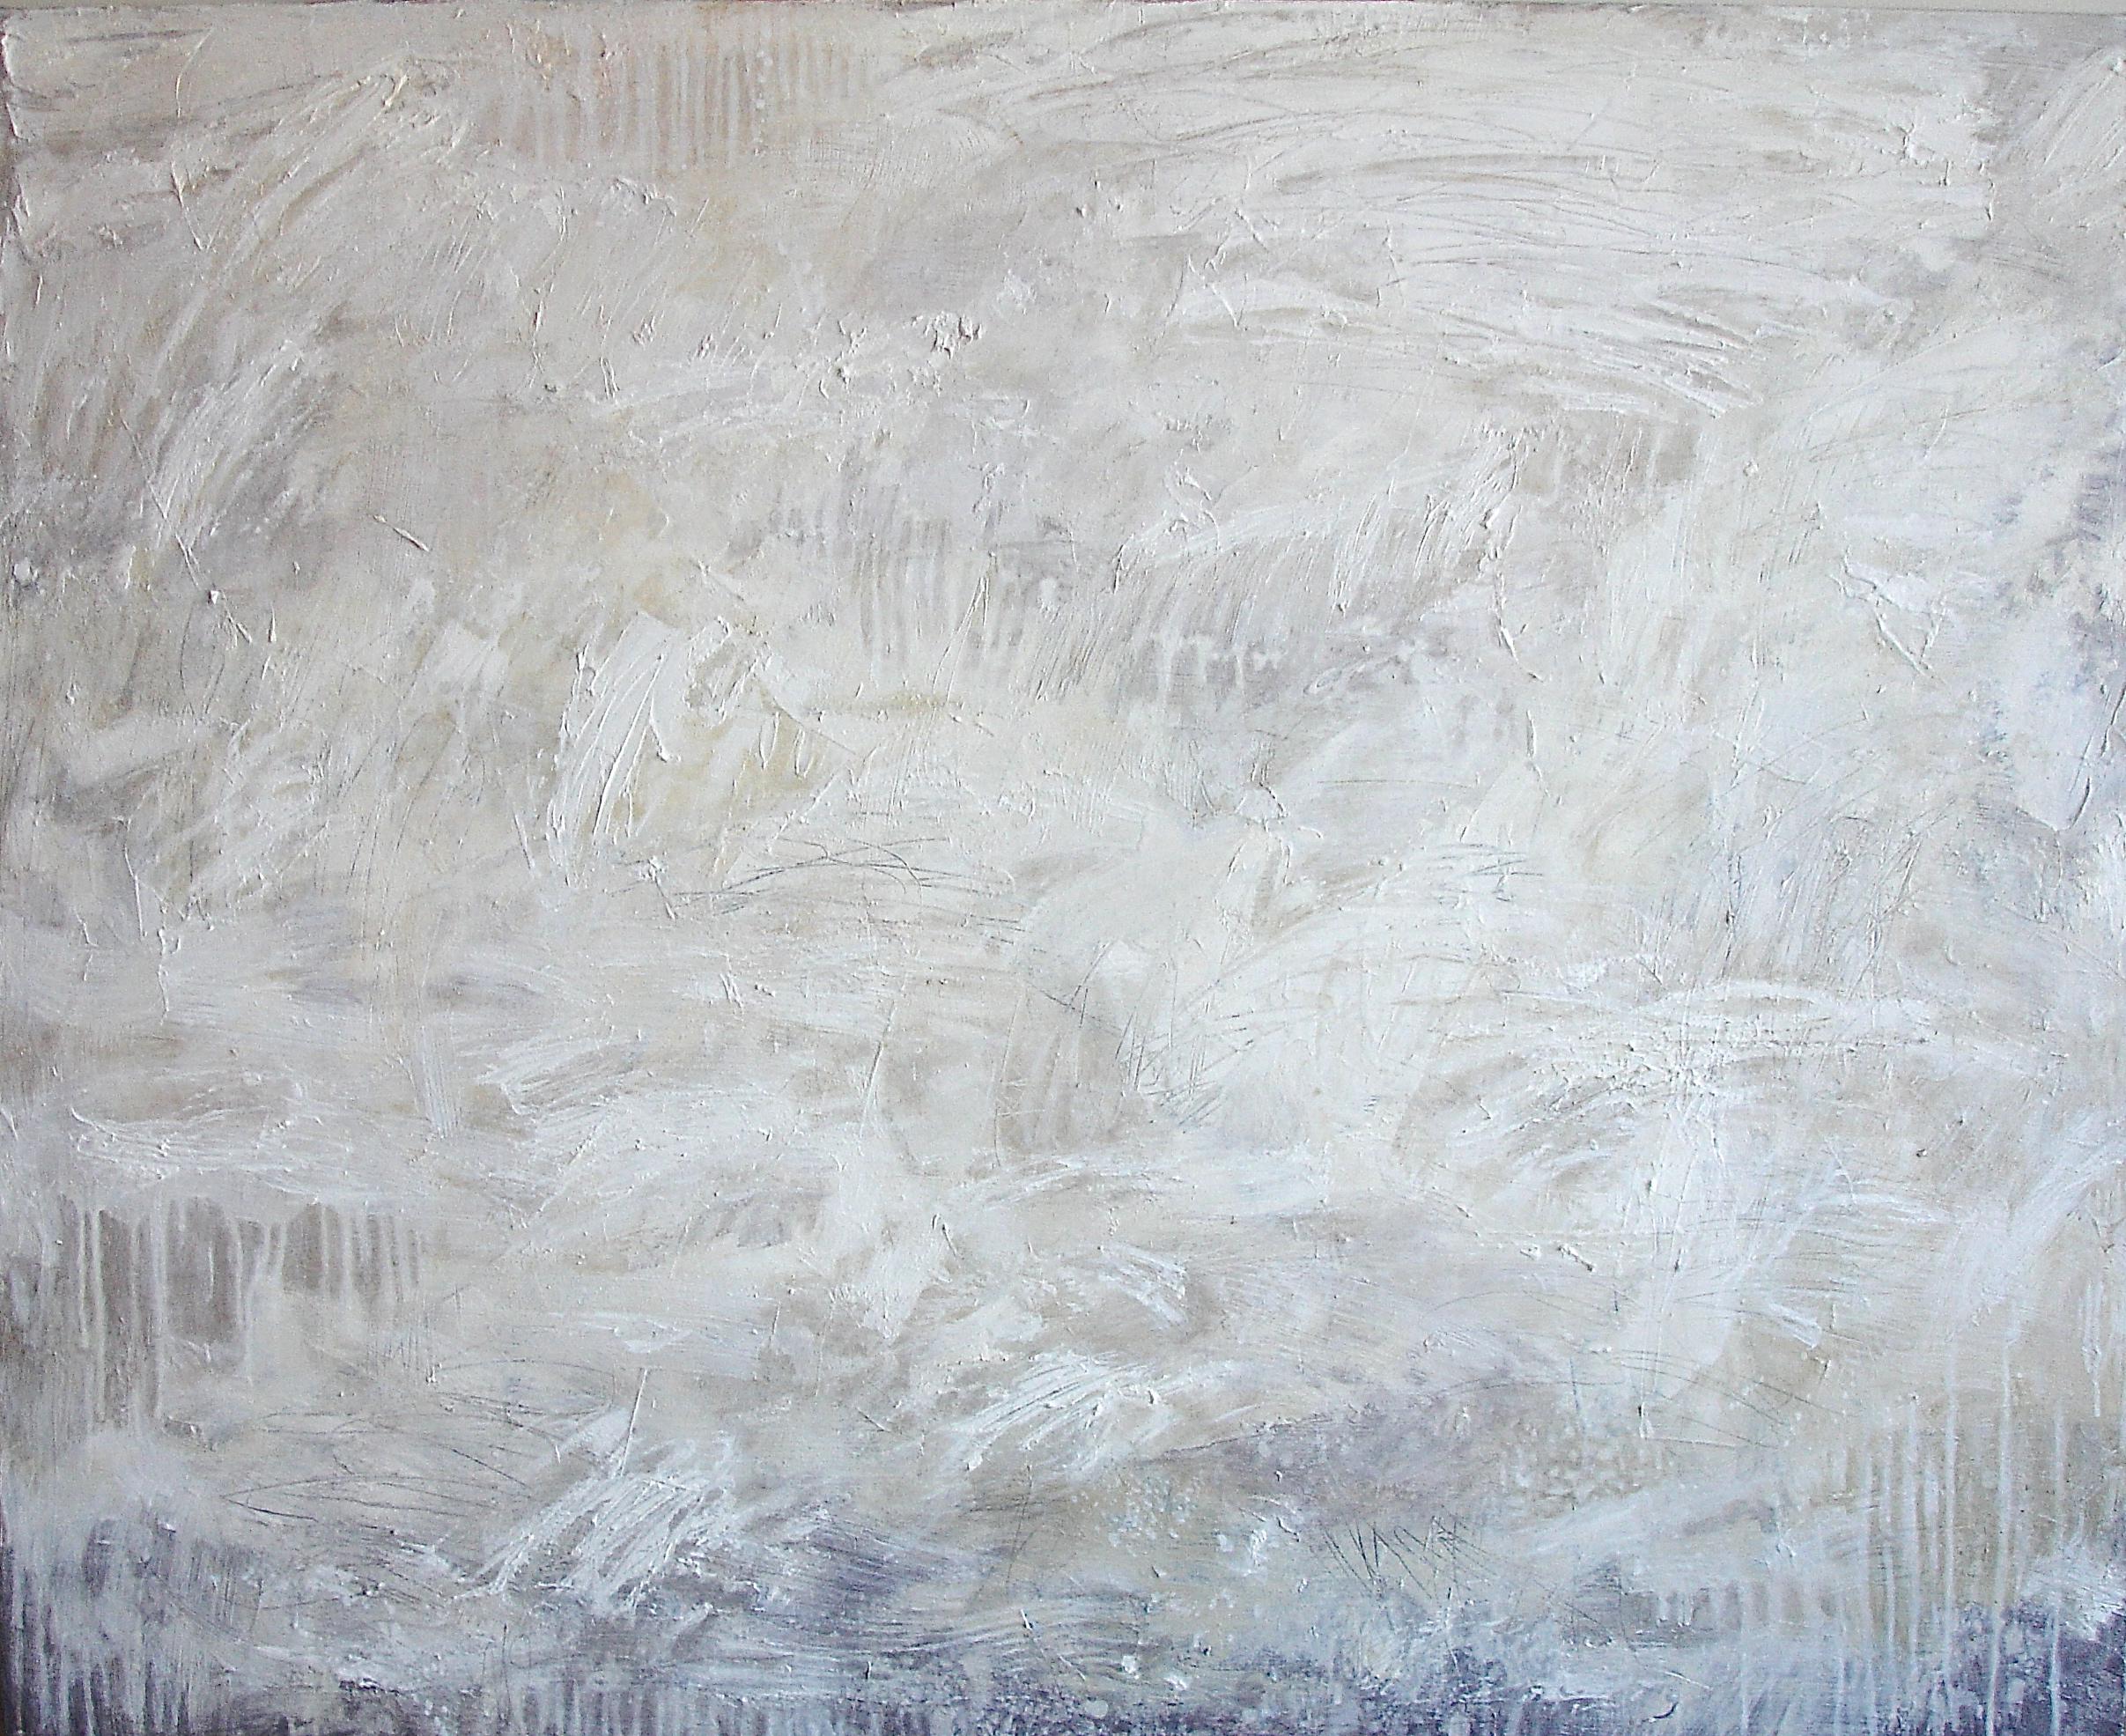 Kati Thanda - Salt Pans 112 x 137cm